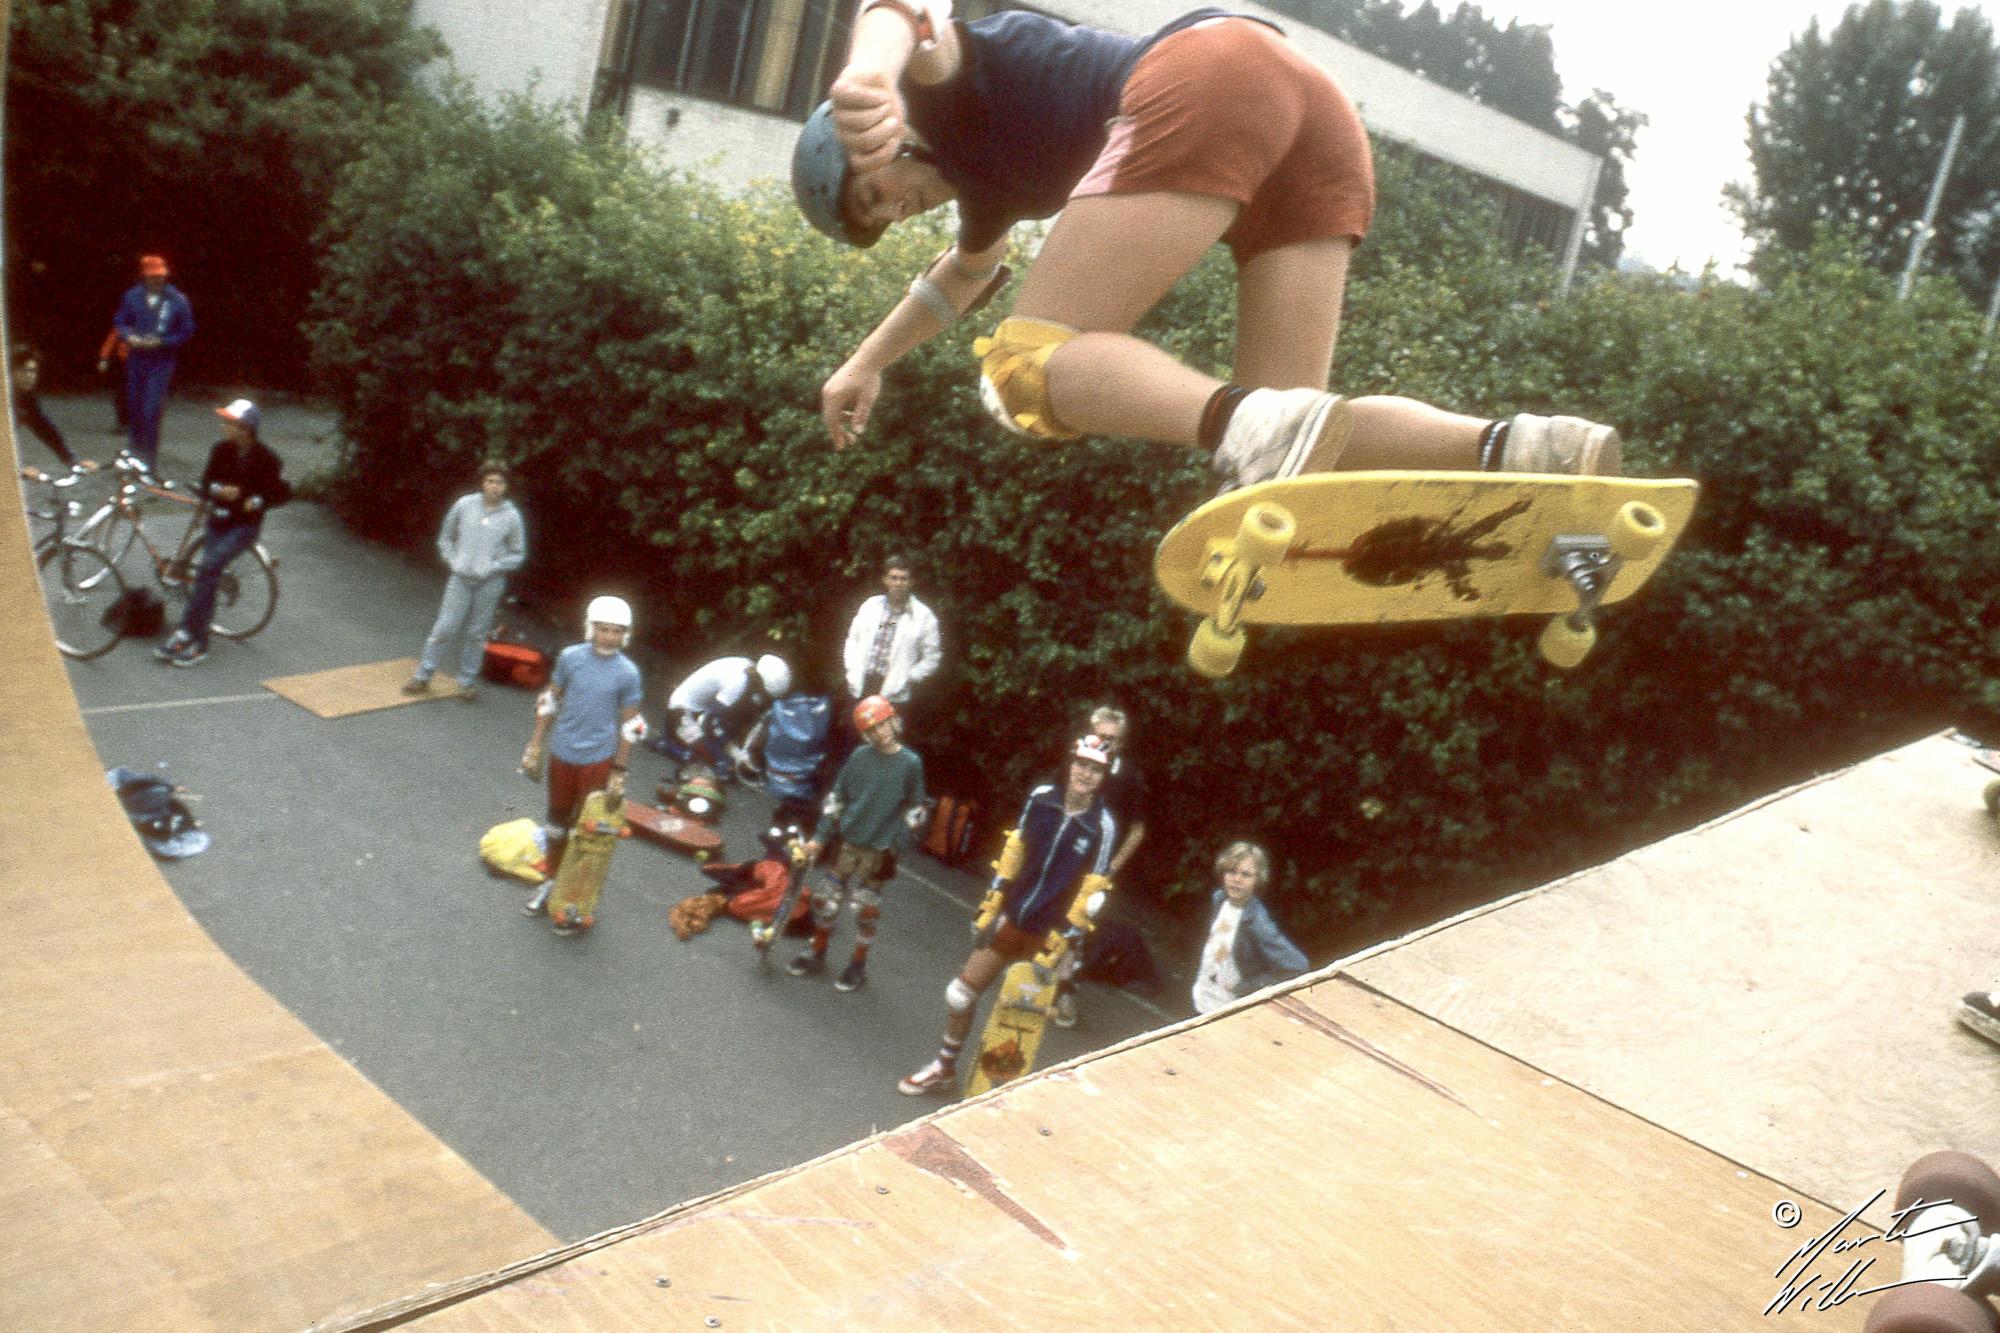 Hans Göthberg, Backside ollie, SM, Täby 1981